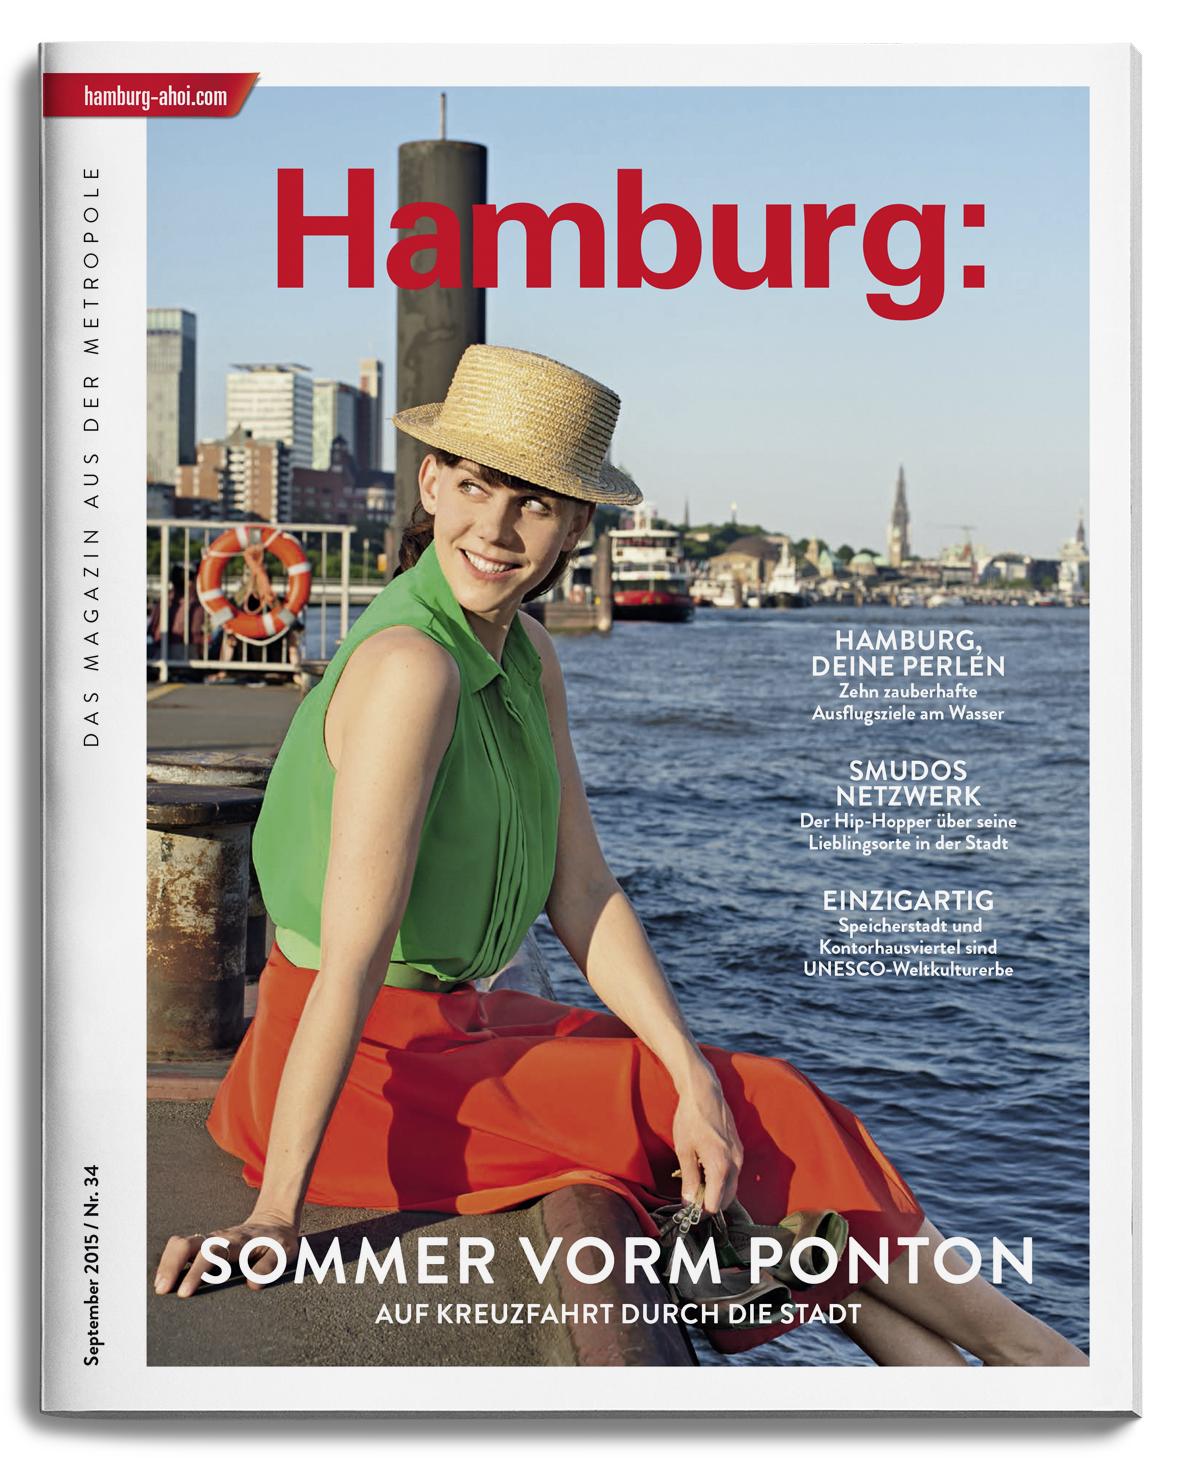 mediaserver ergebnis hamburg marketing